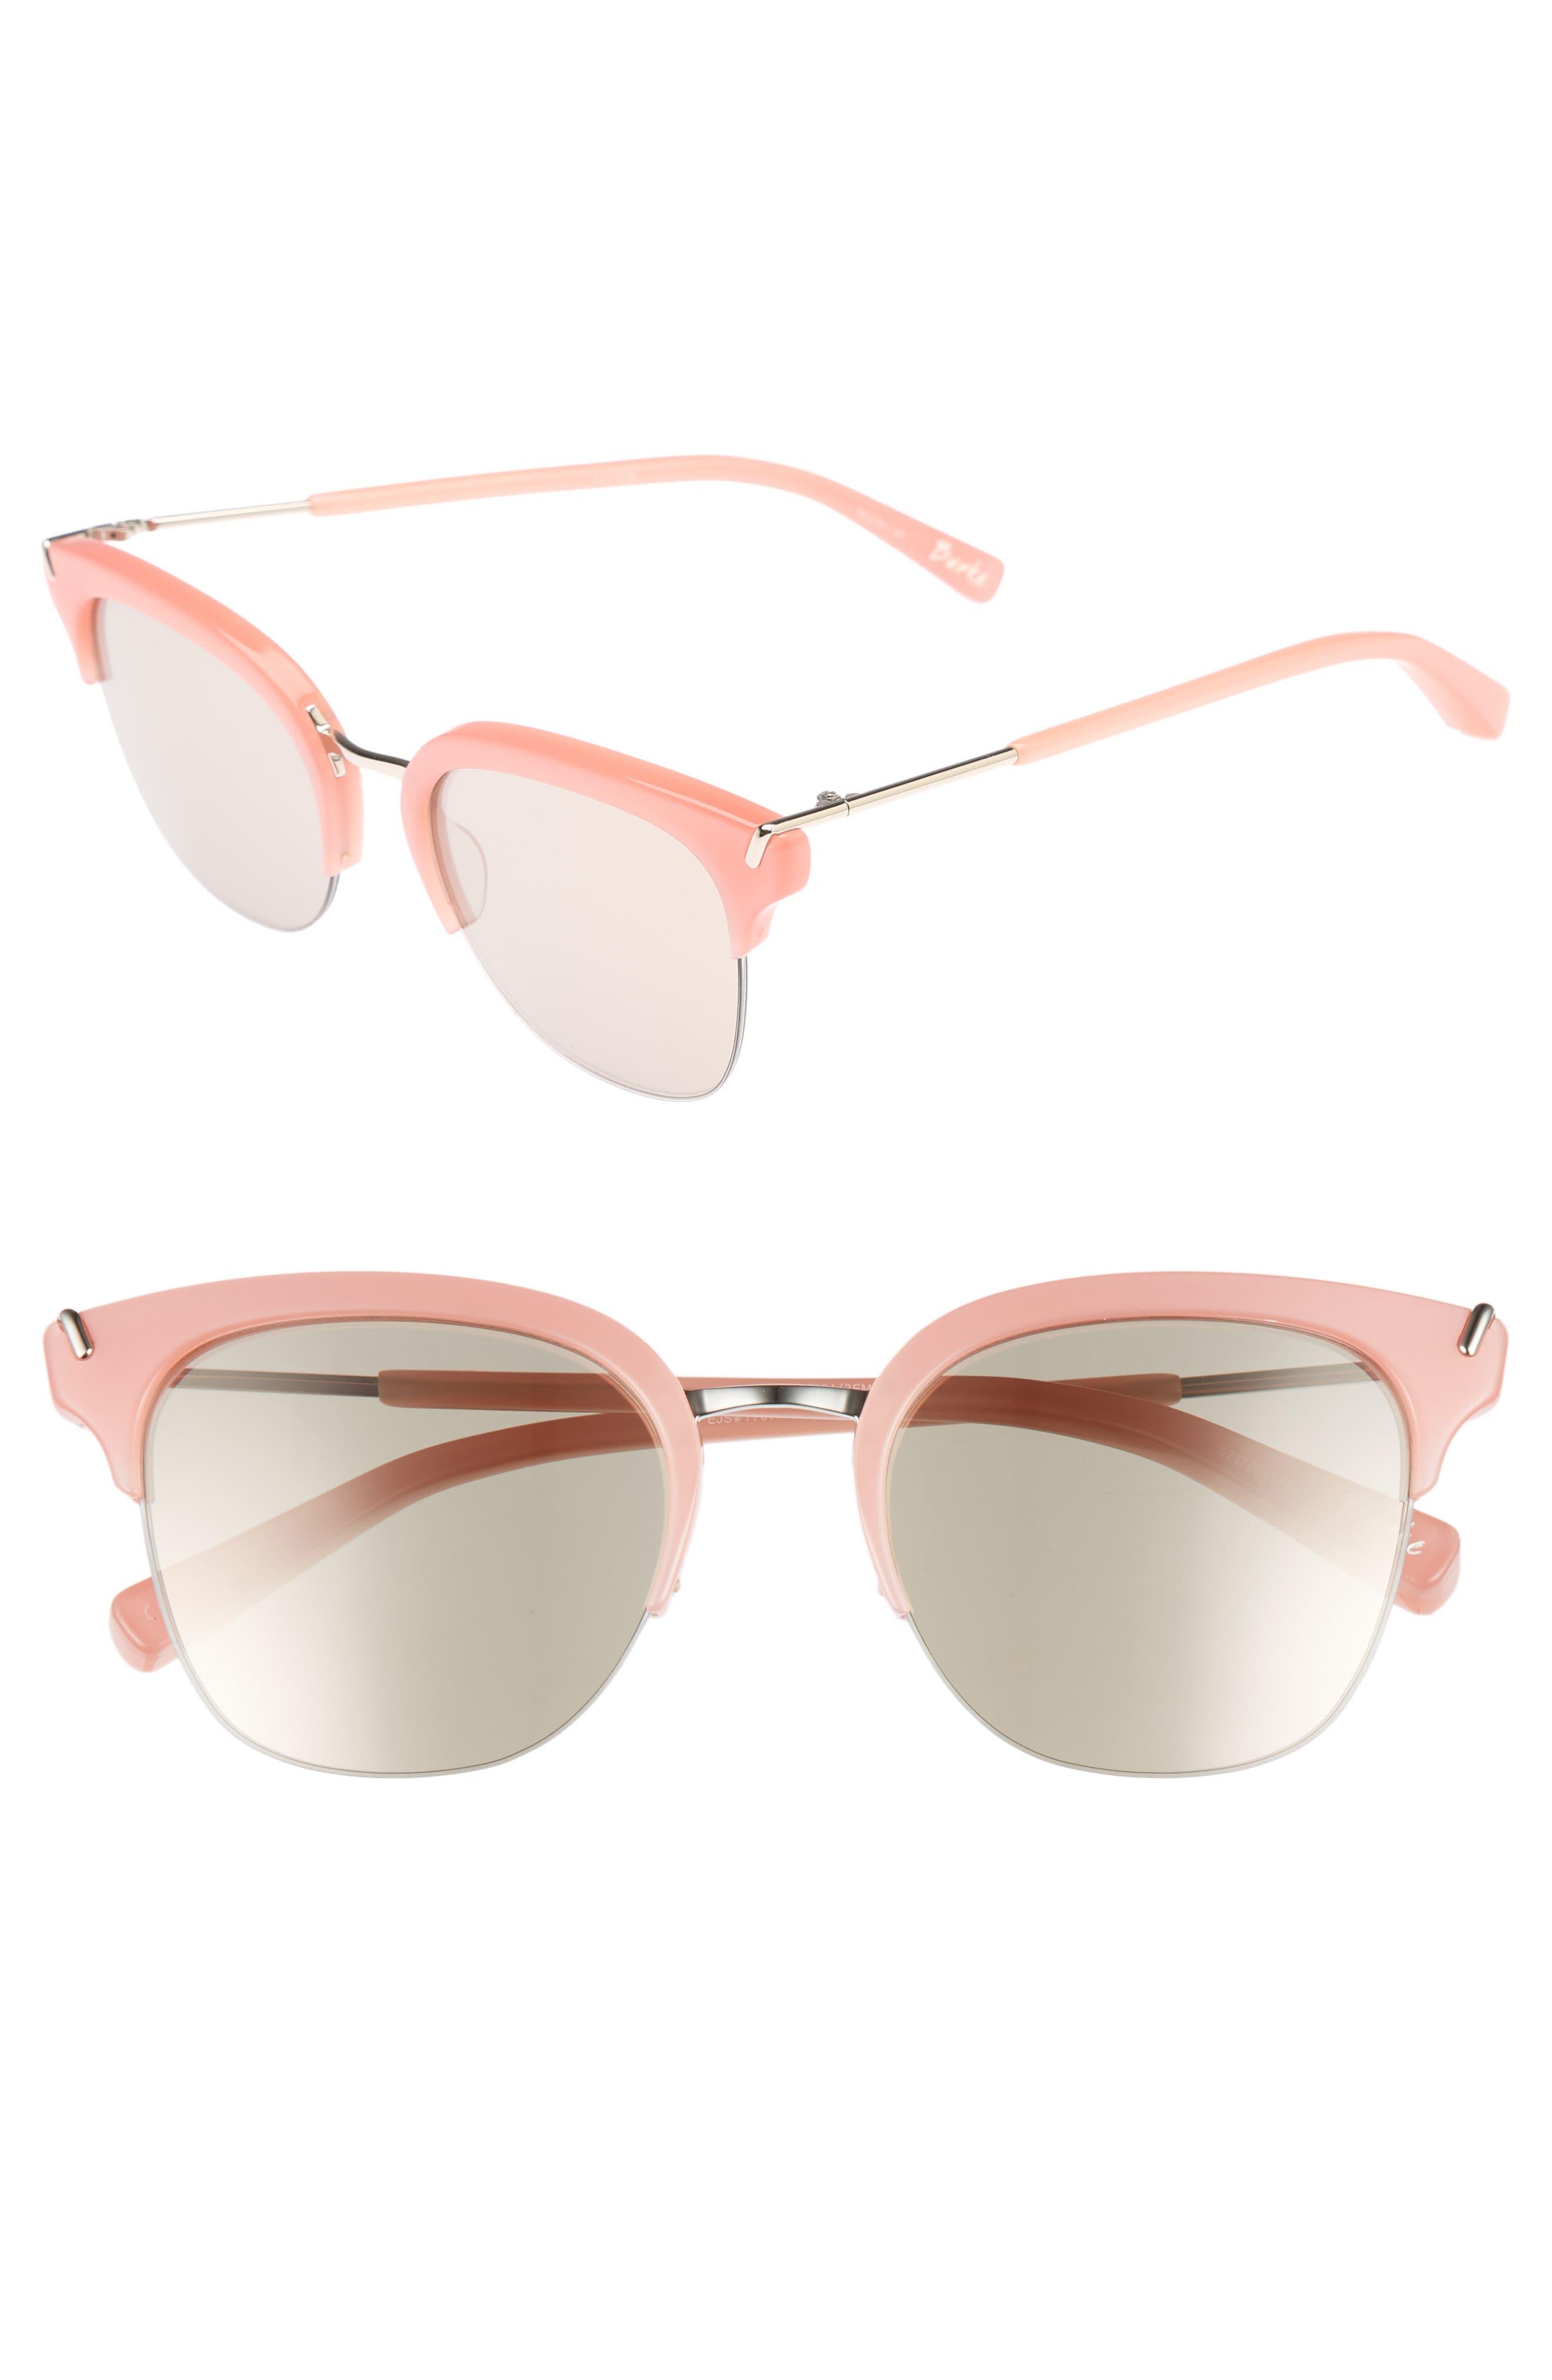 Burke 52mm Horn Rimmed Sunglasses,                         Main,                         color, 001